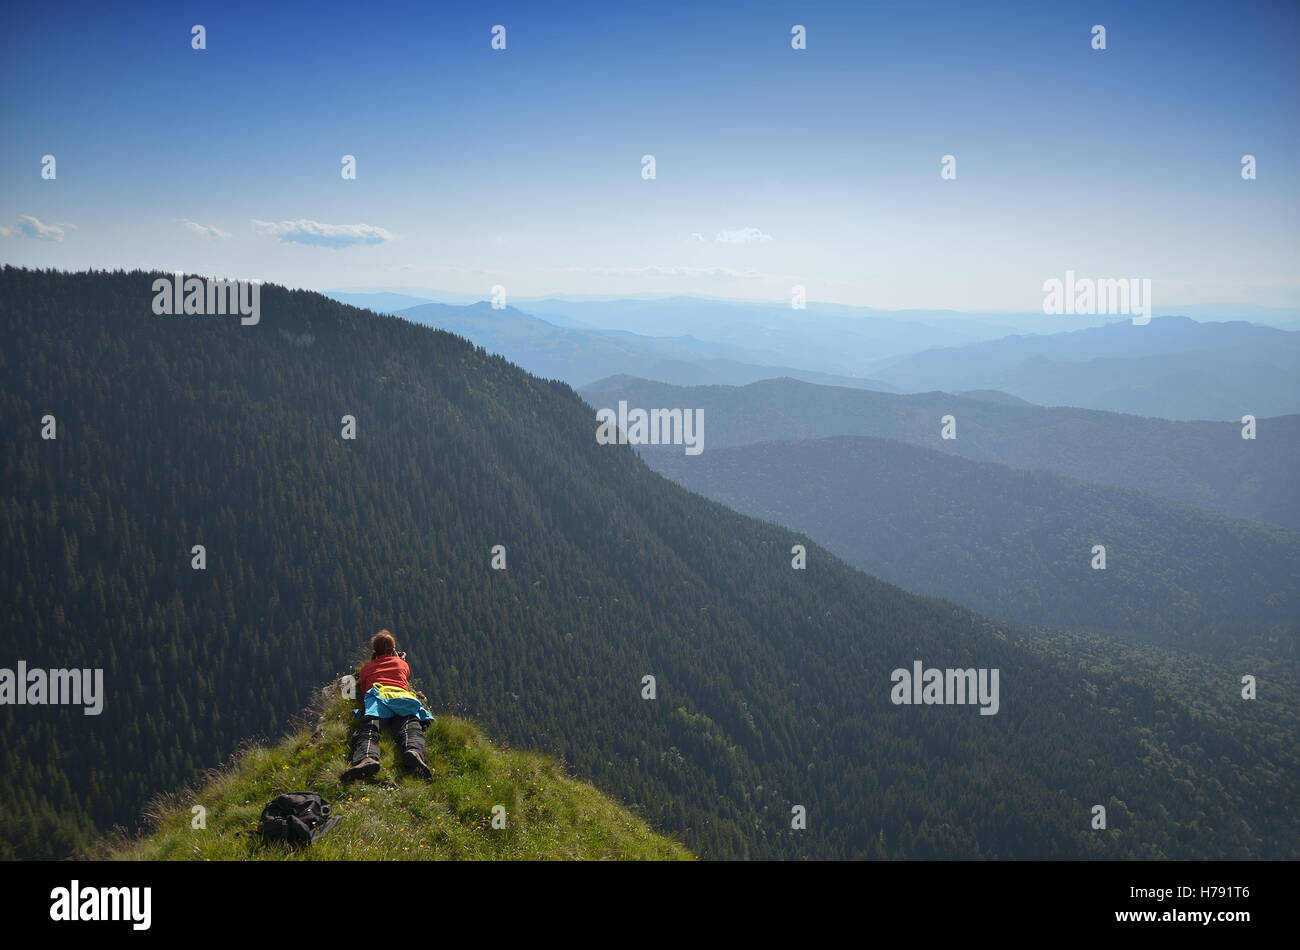 Fotógrafas en la cima de una montaña el paisaje de disparo Imagen De Stock